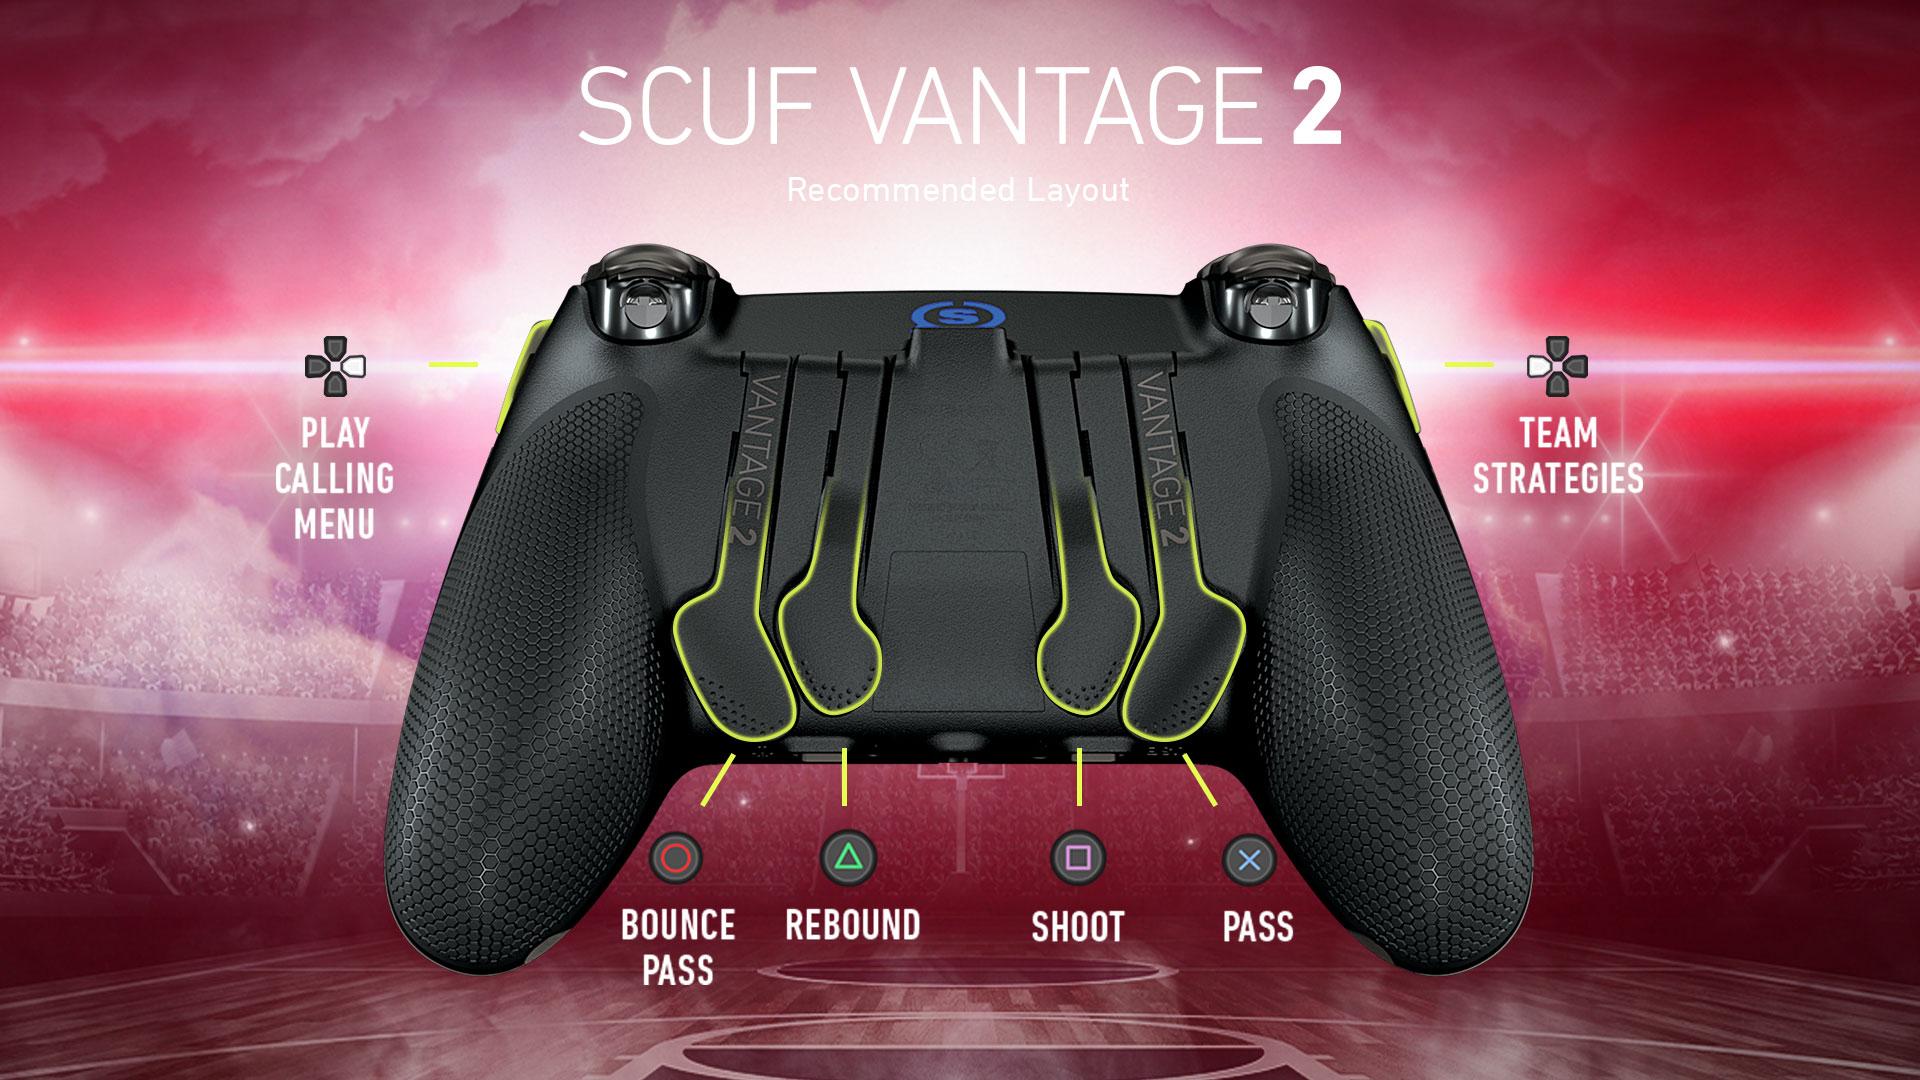 SCUF Vantage 2 NBA 2K20 Controller Configuration